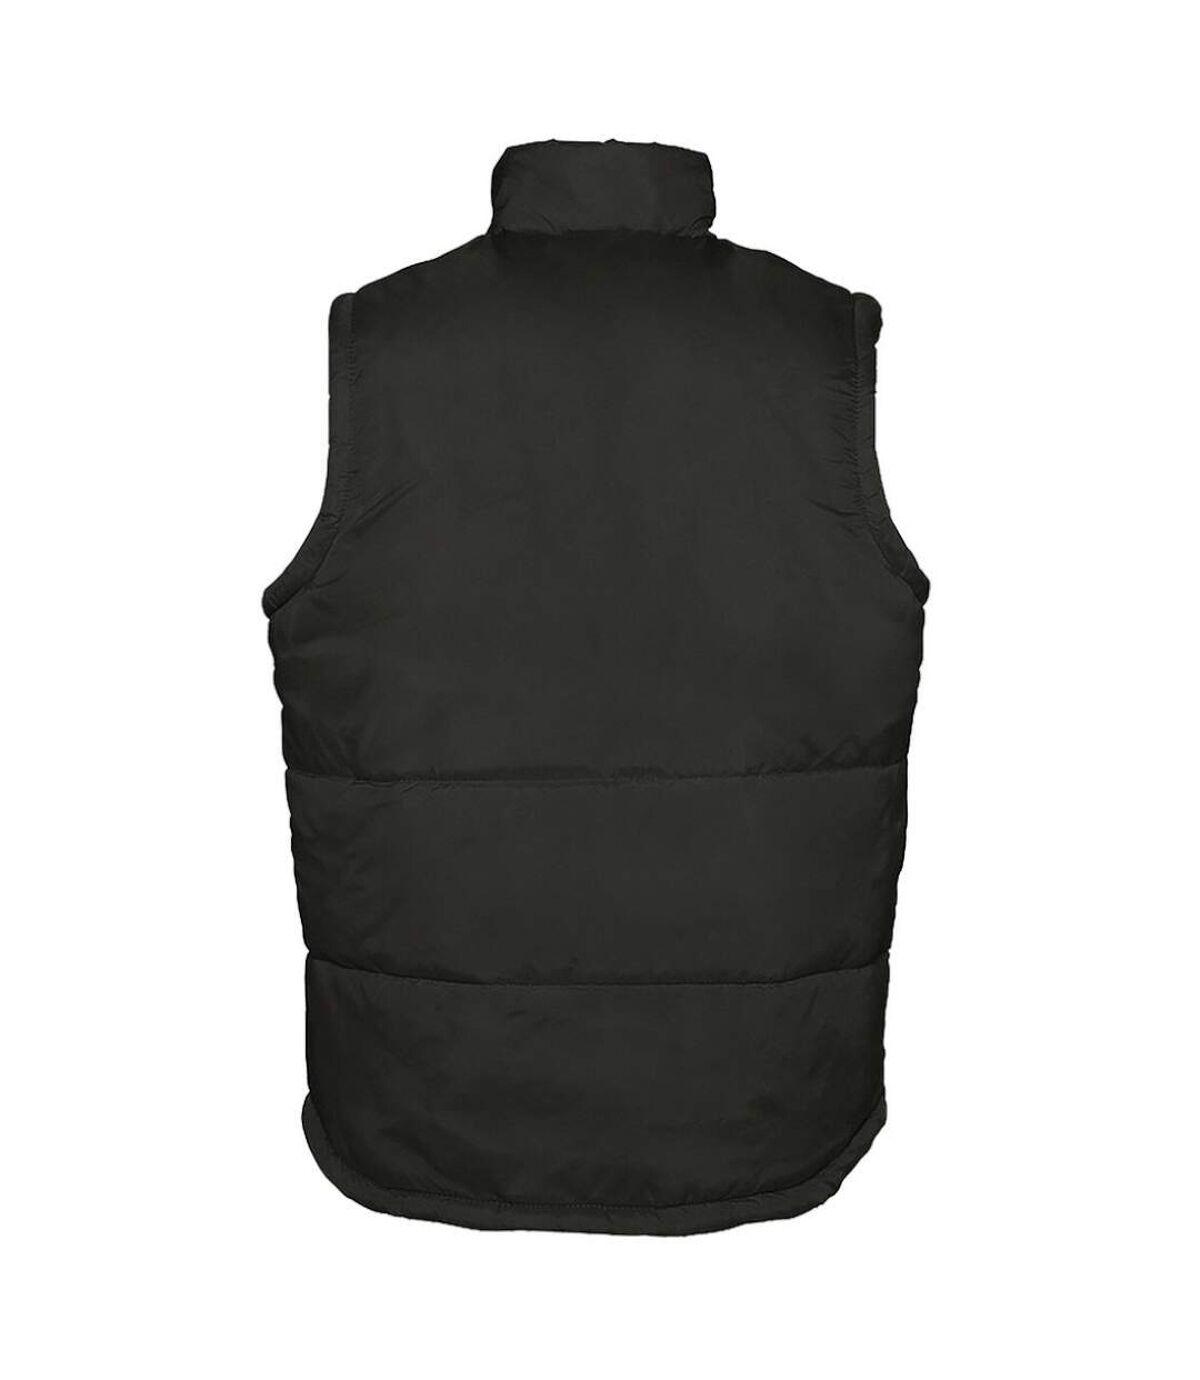 SOLS Warm Unisex Padded Bodywarmer Jacket (Royal) - UTPC355